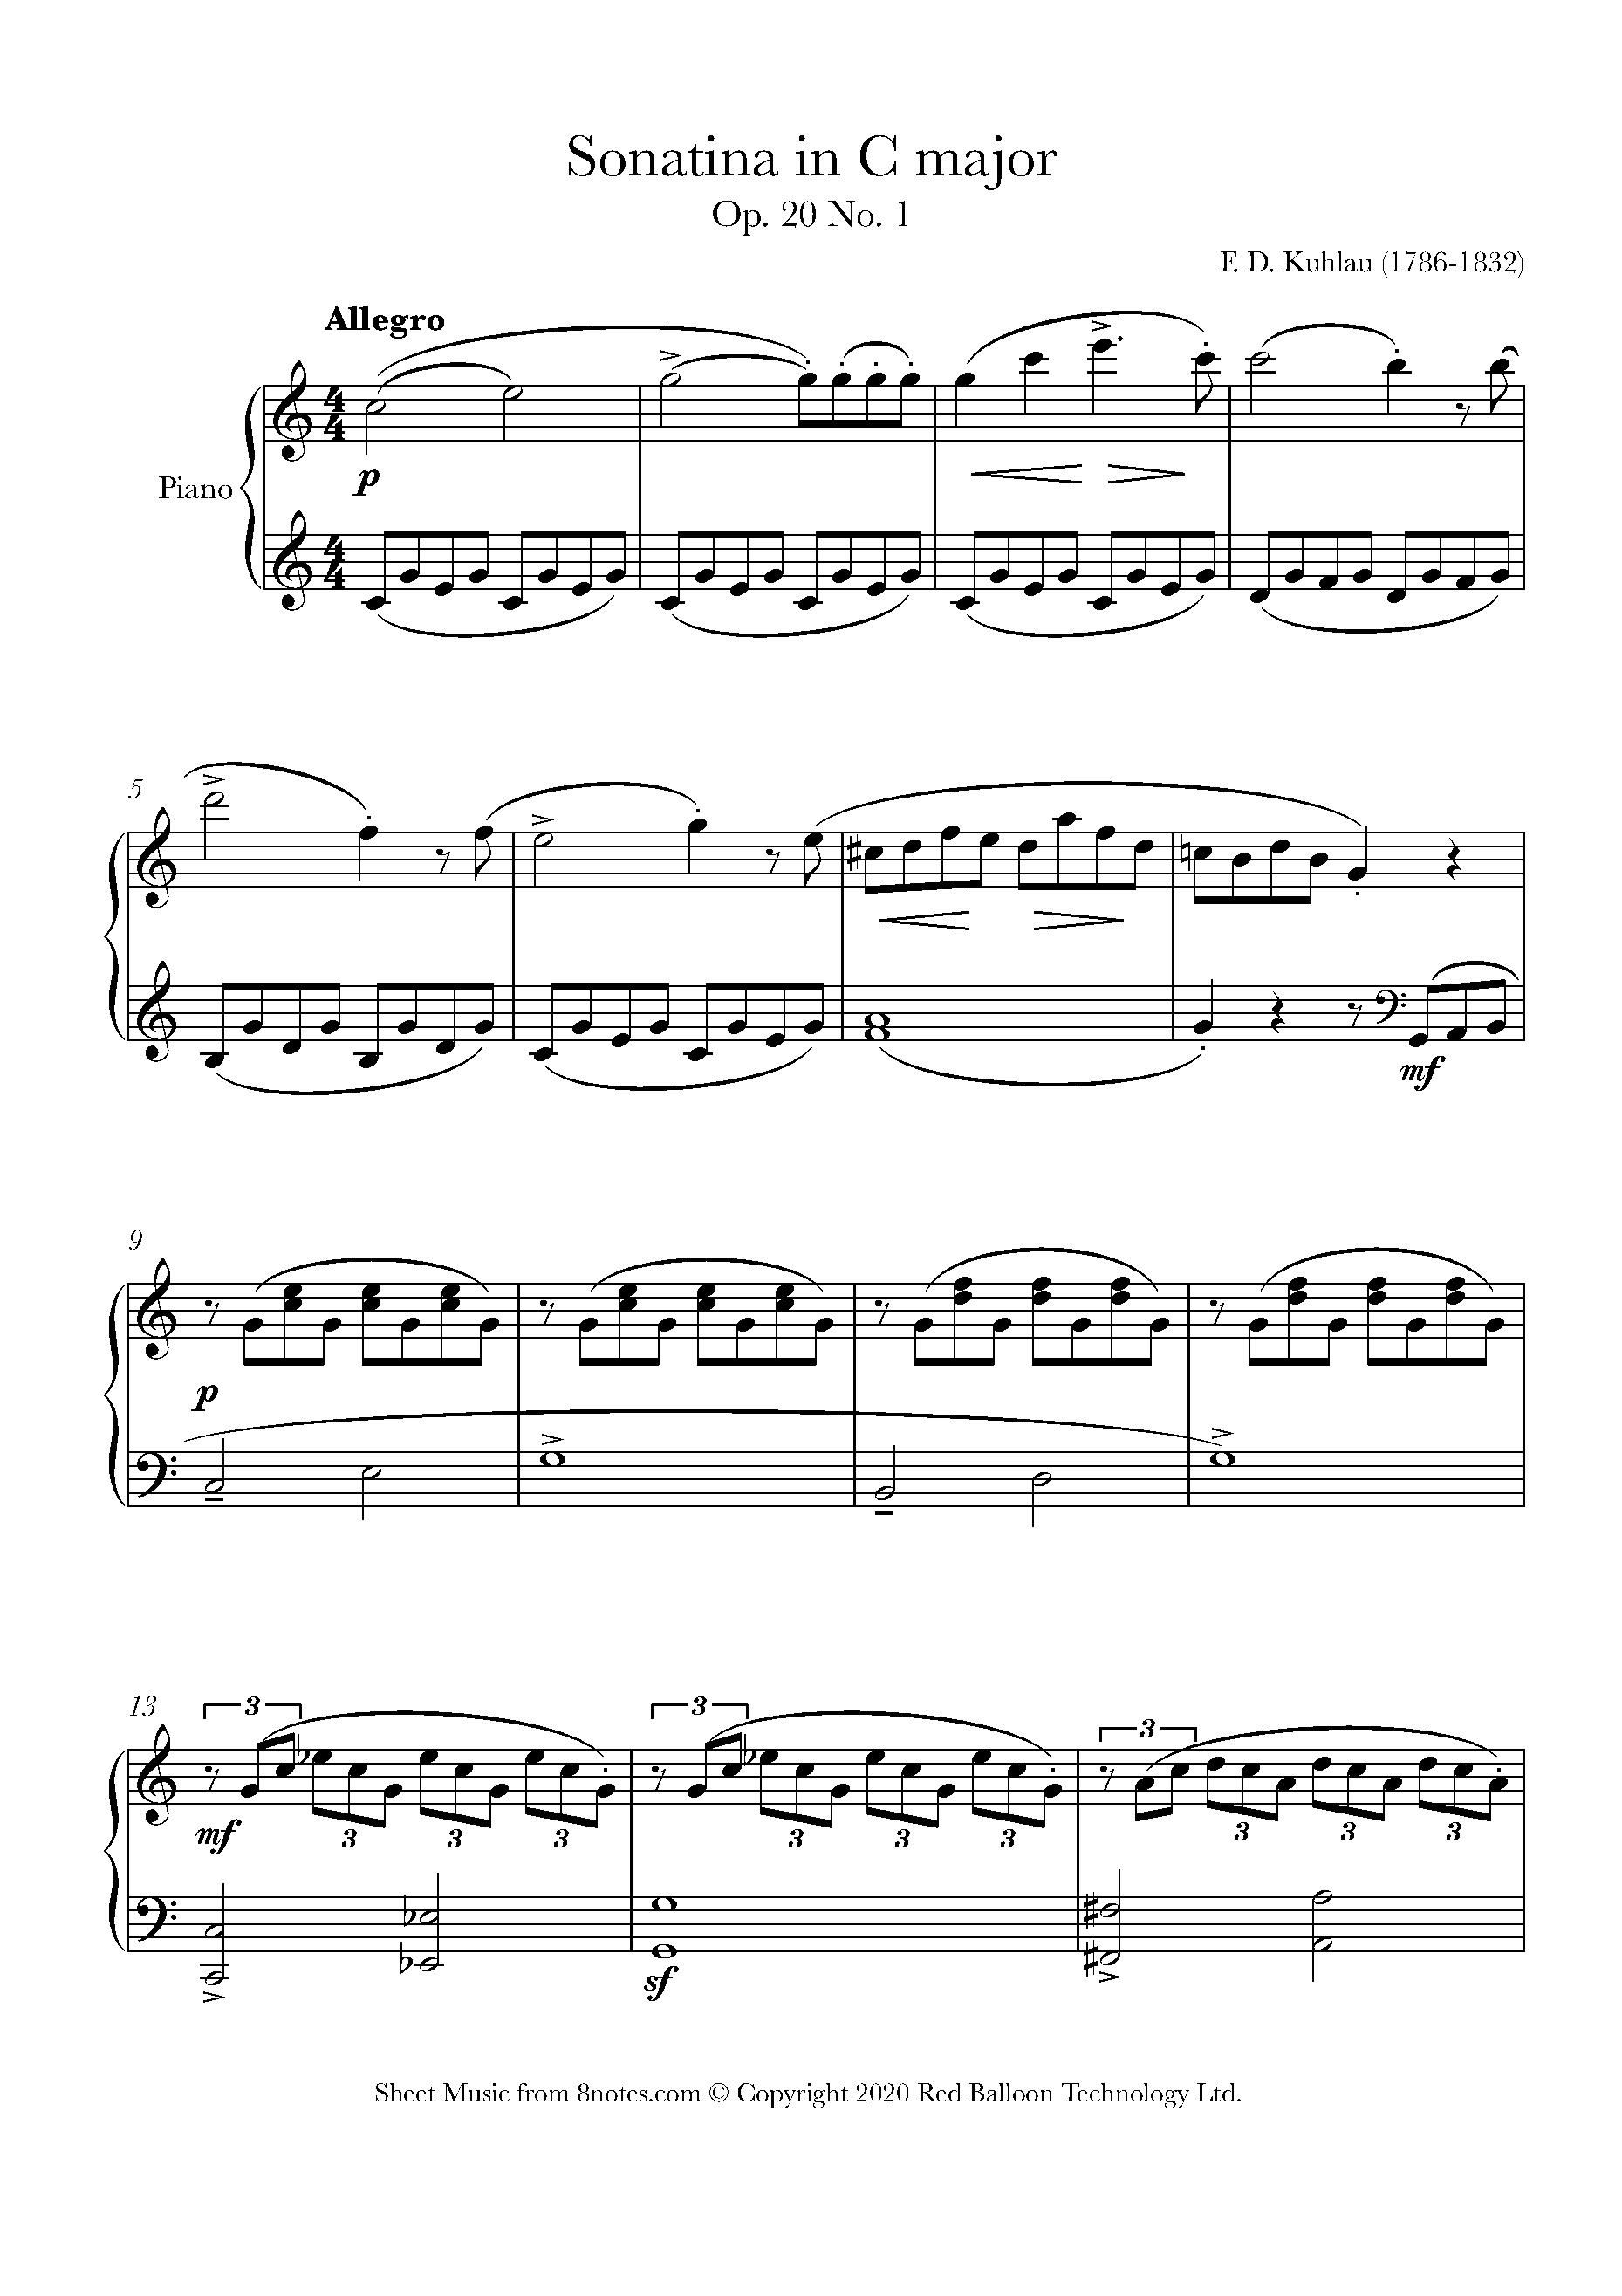 kuhlau - sonatina in c major, op. 20 no. 1 sheet music for piano -  8notes.com  8notes